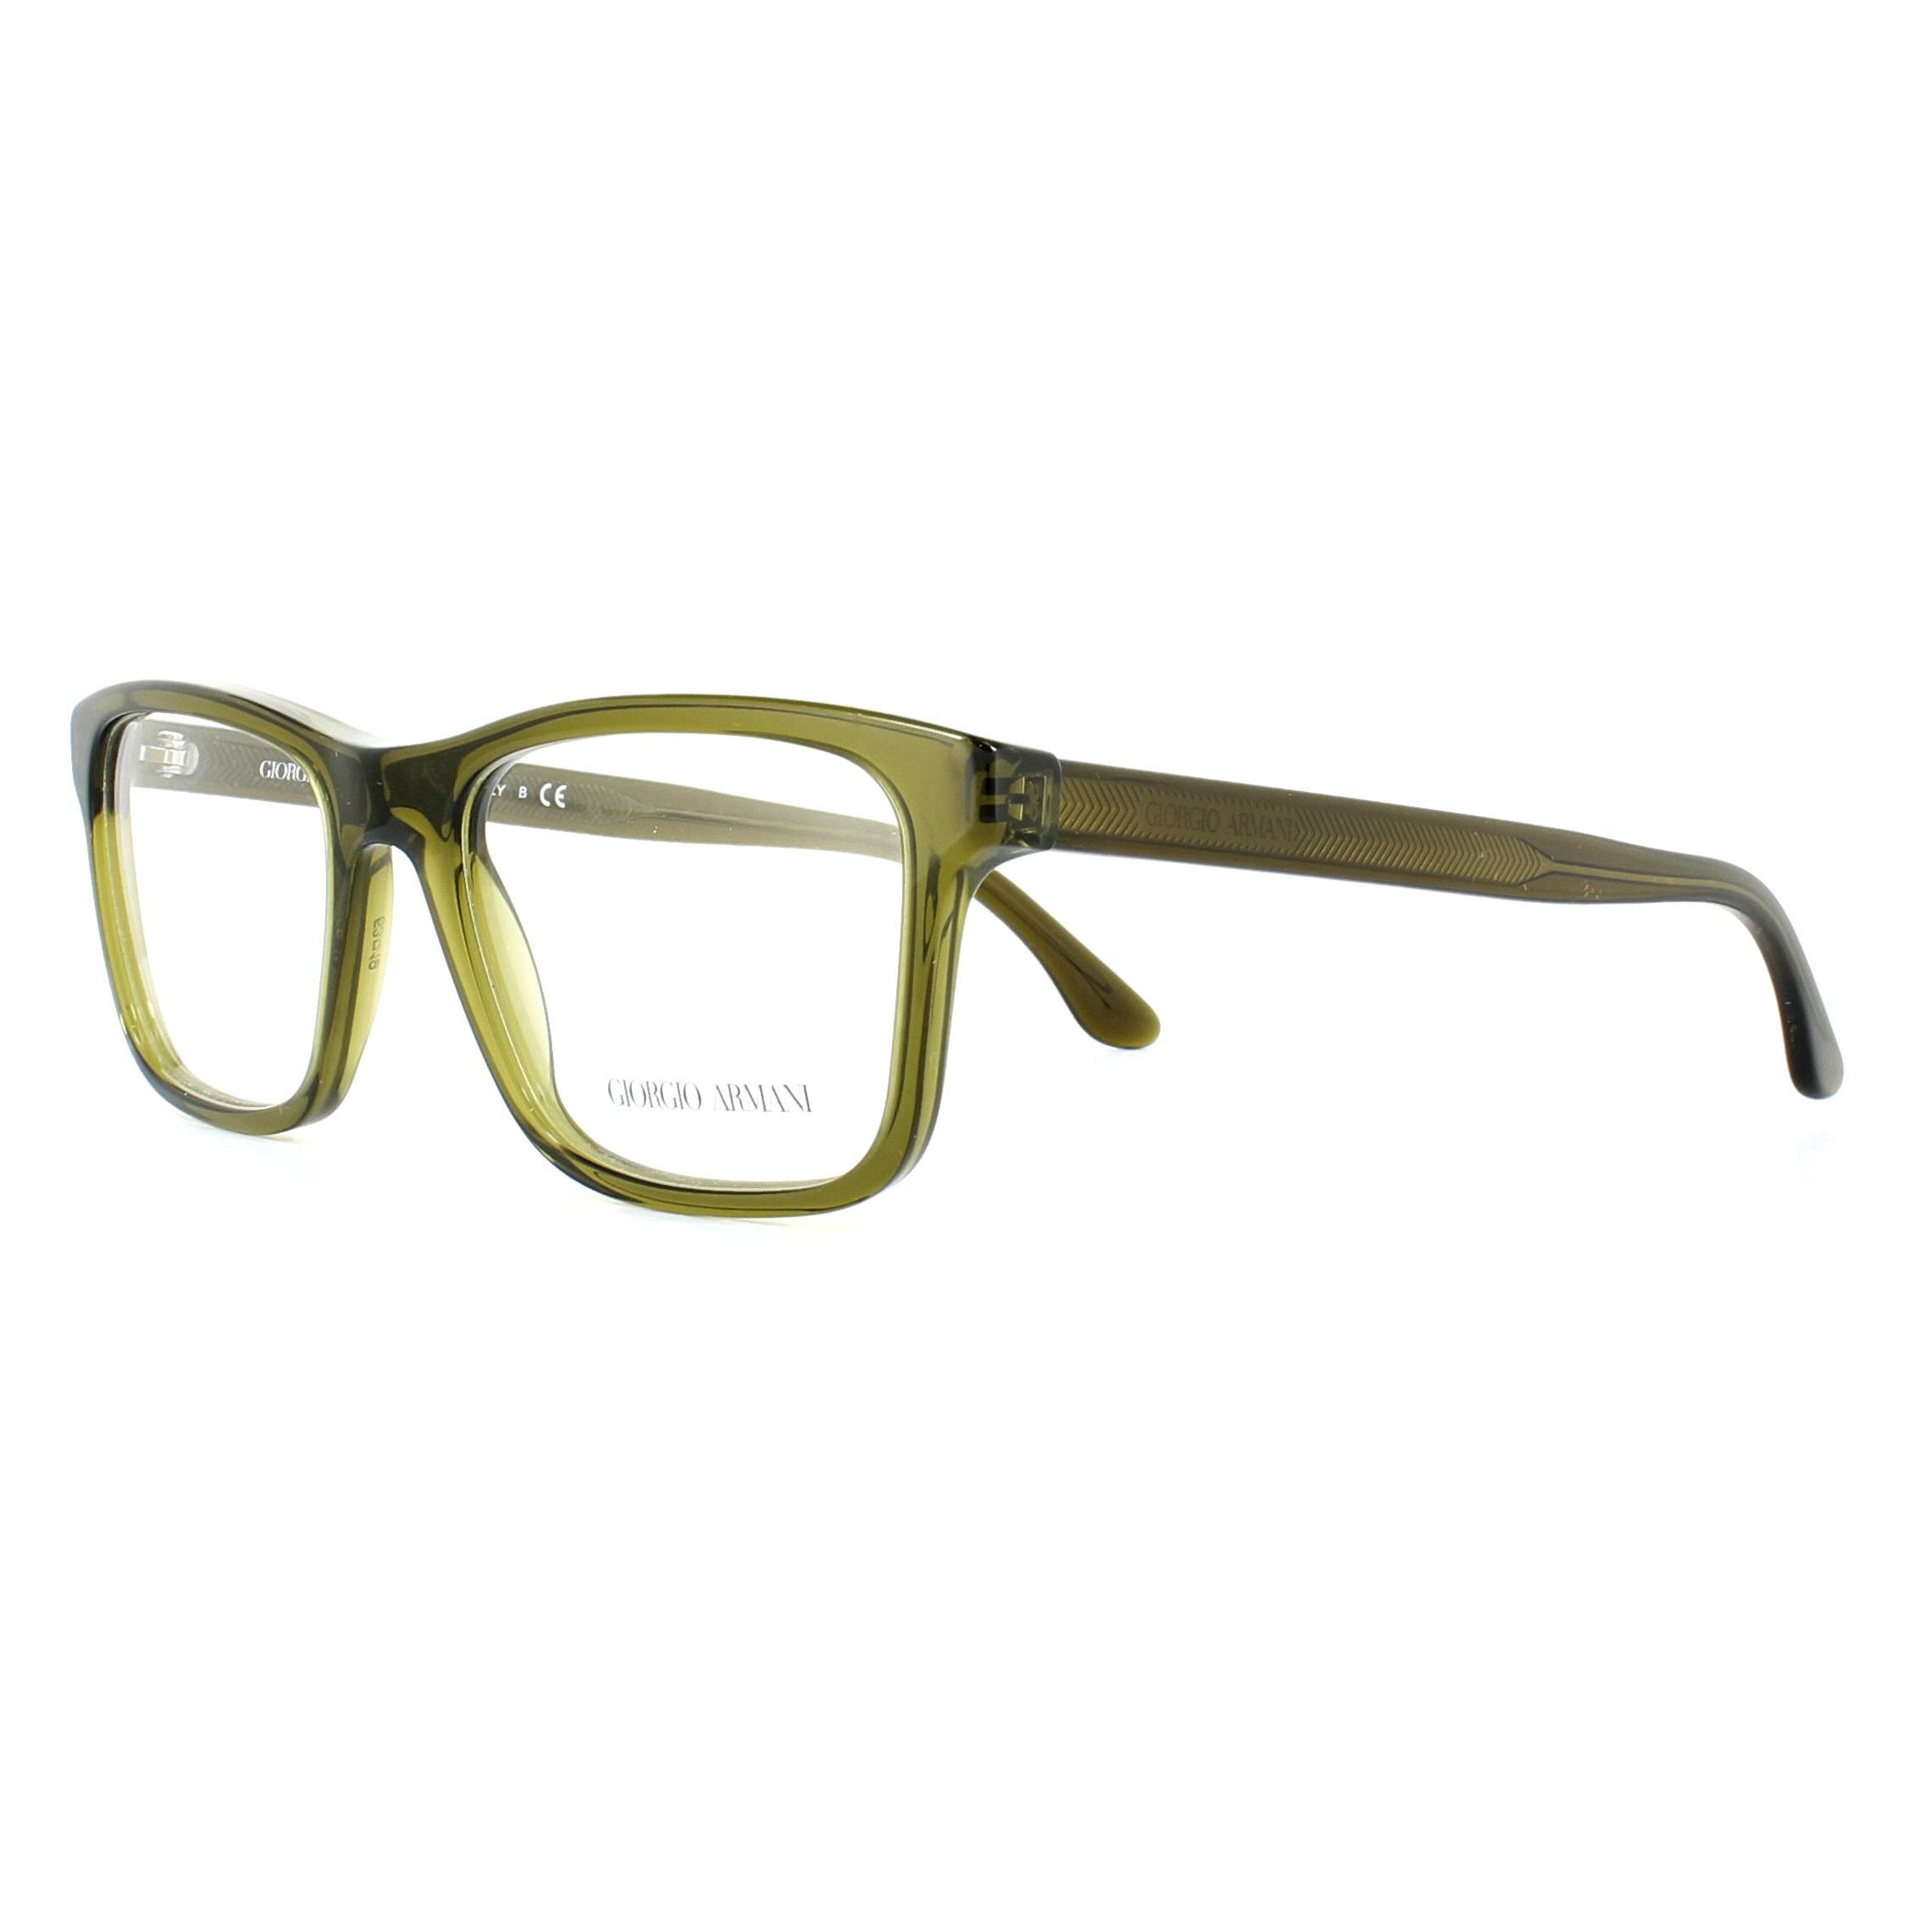 9dc8d5cd8884 Sentinel Giorgio Armani Glasses Frames AR7088 5439 Transparent Green 53mm  Mens